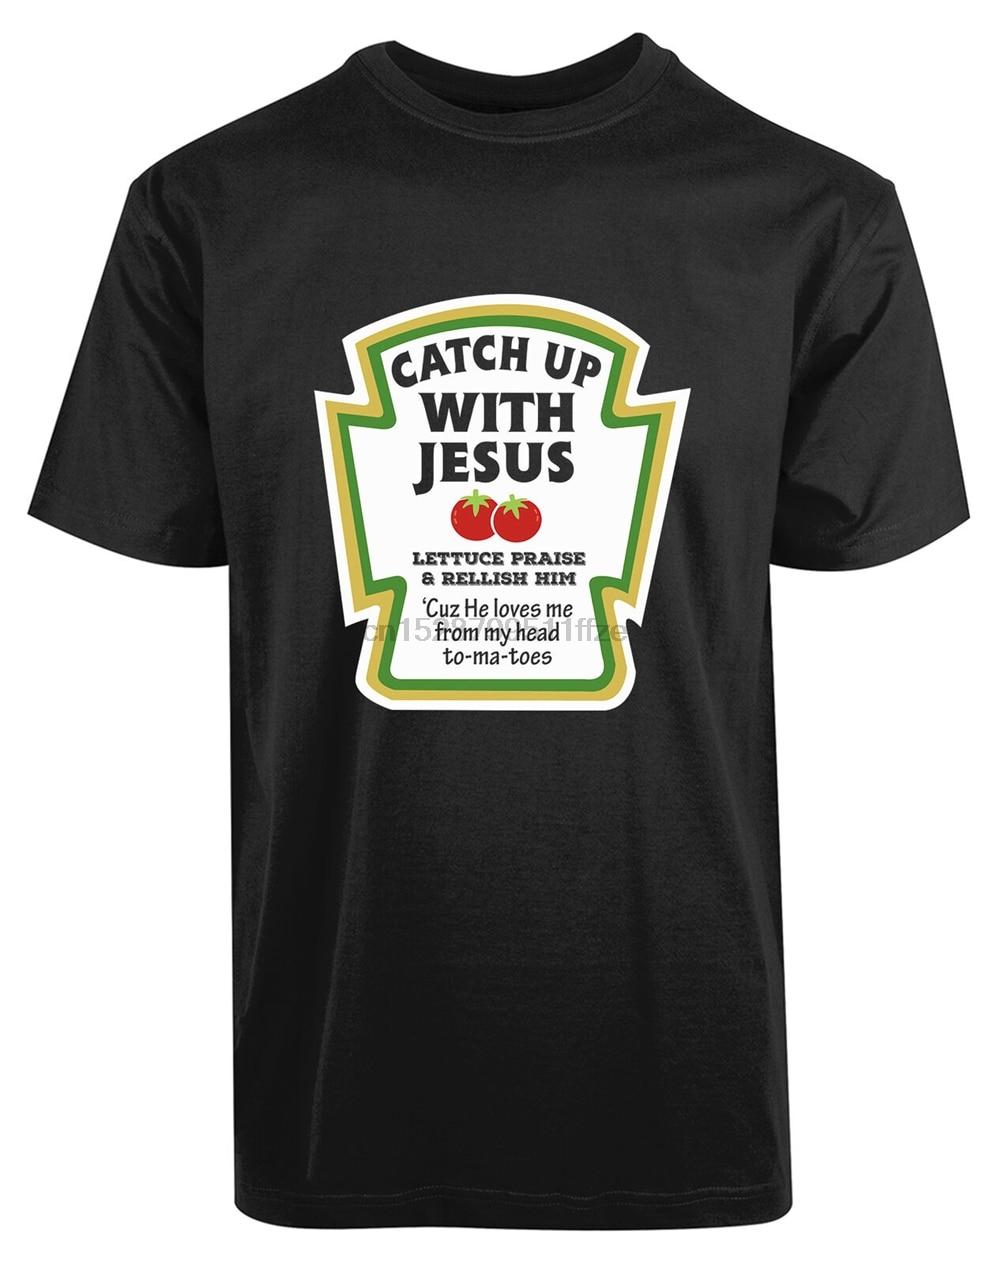 Nueva camiseta para hombre con Jesús Ketchup, camiseta Blessed From My Heart To Ma Toe, camiseta de calidad Superior